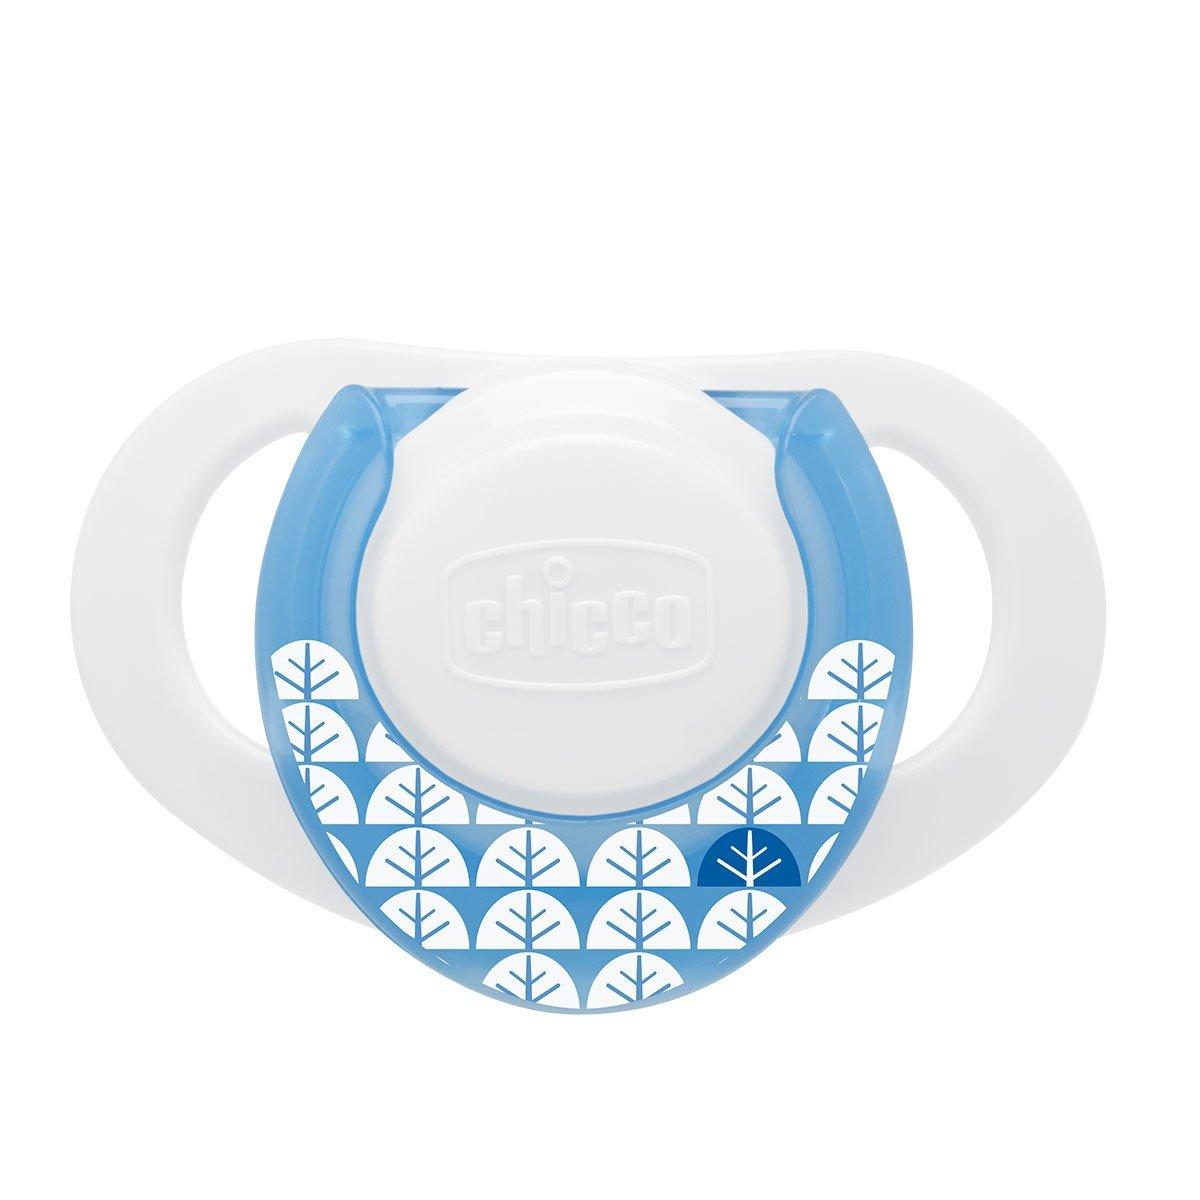 Chicco Physio Compact - Chupete de látex/caucho para 0-6 meses, color azul